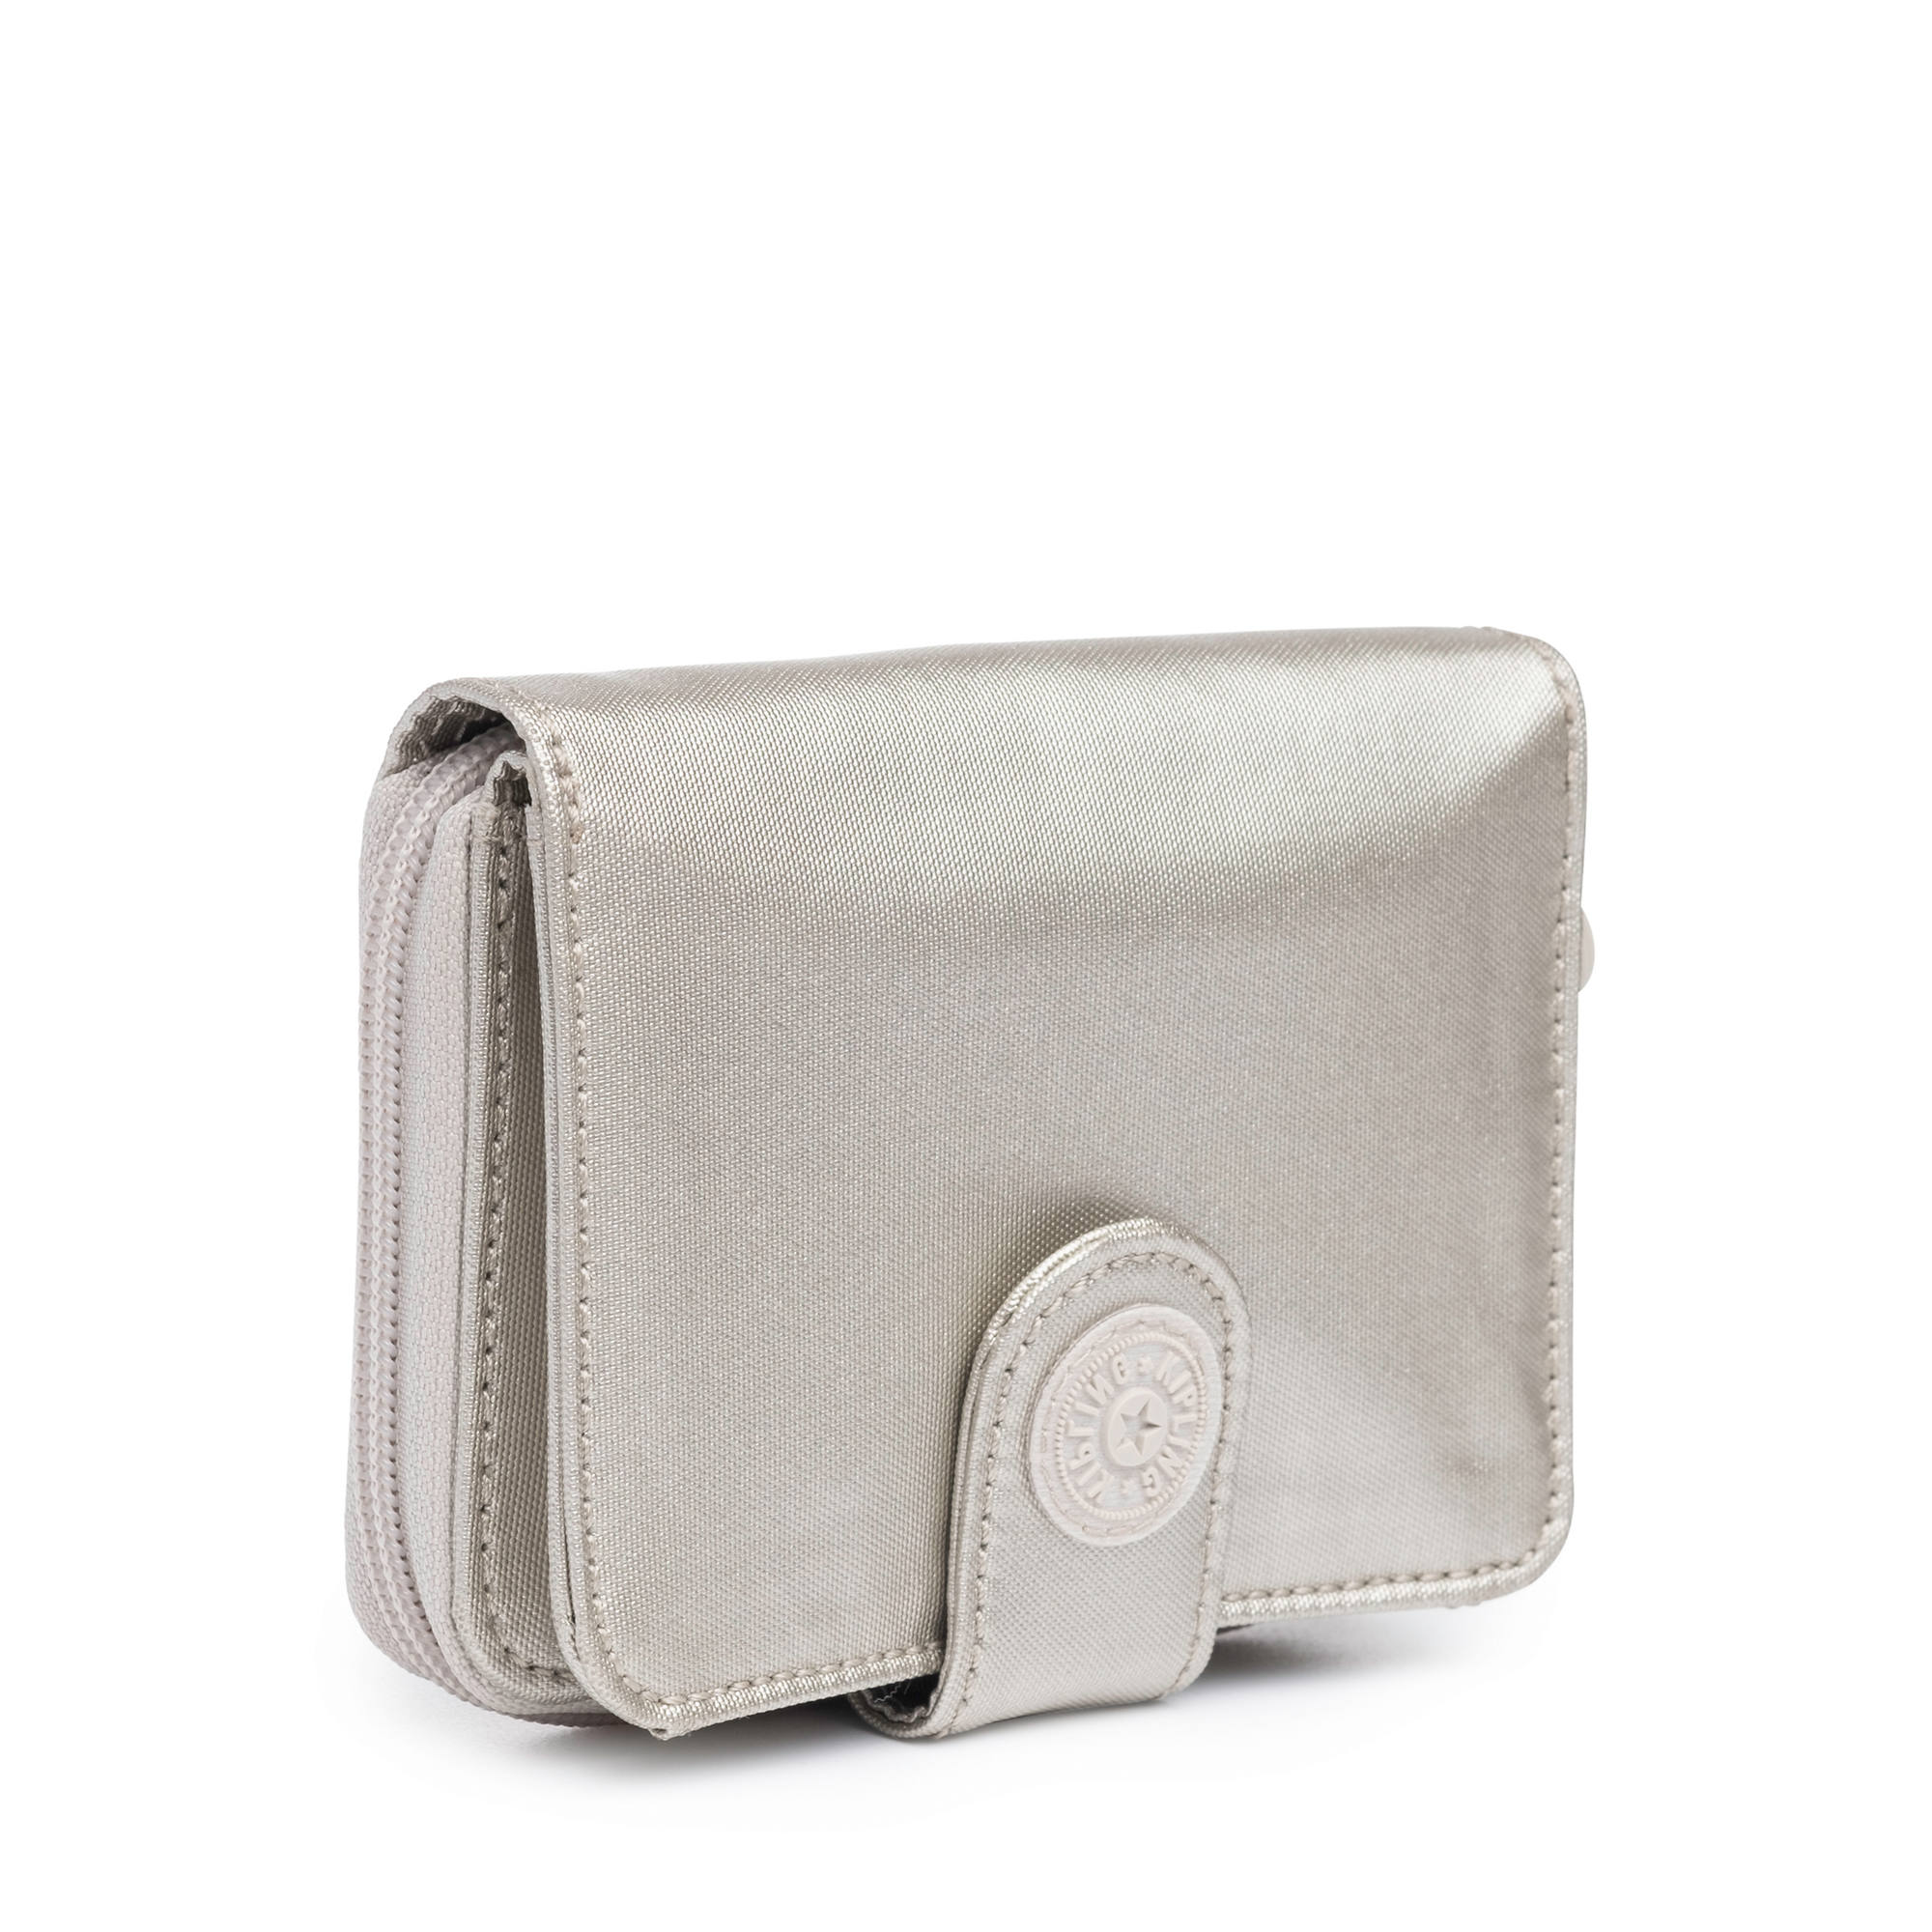 92eef991a67 Kipling-New-Money-Small-Credit-Card-Wallet thumbnail 11